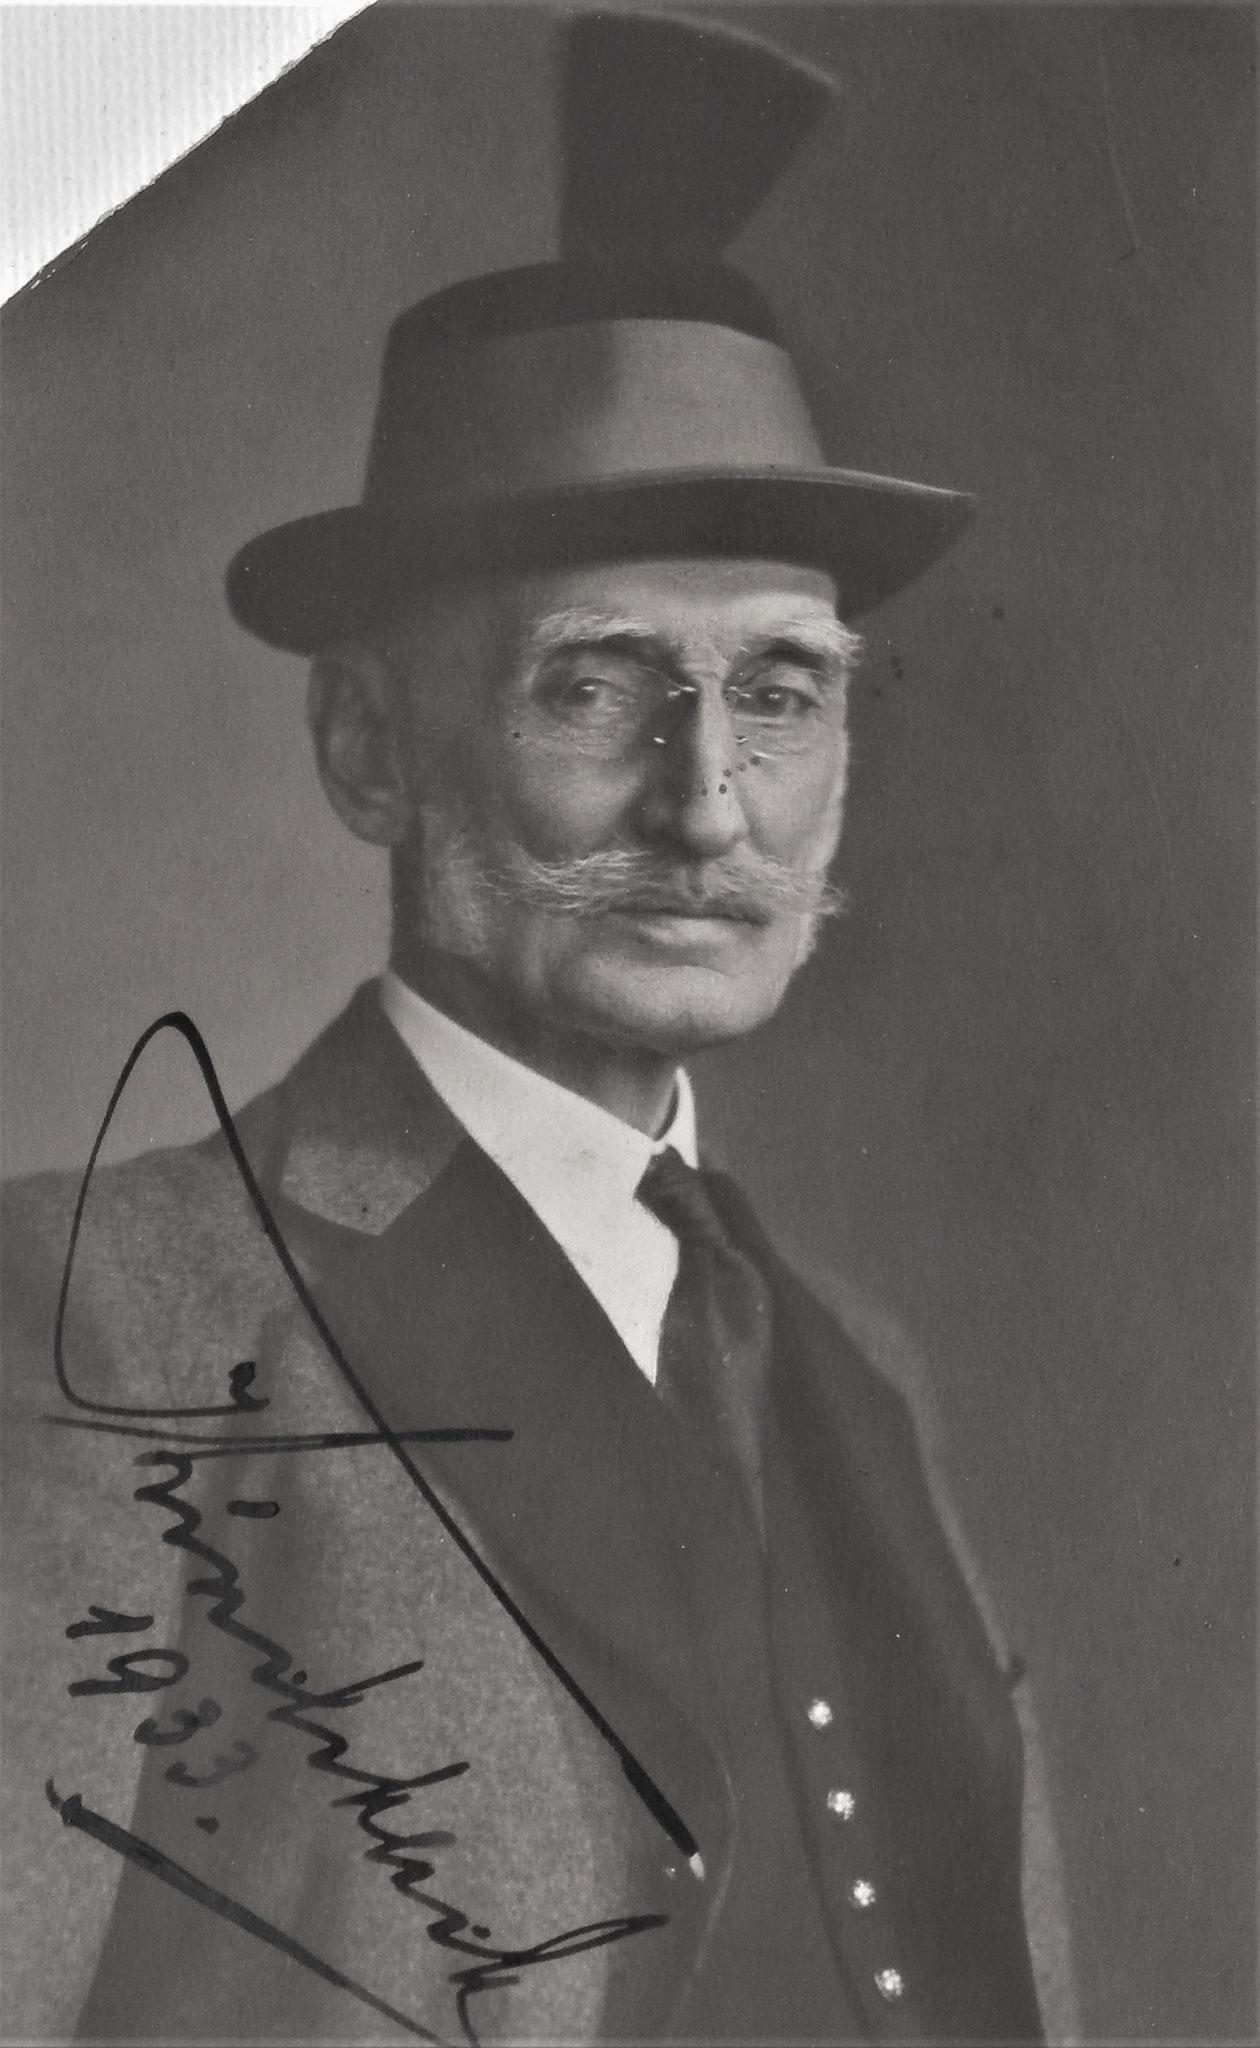 GenObst Karl Kirchbach 1933, 1900-1904 Kdt DR 5.